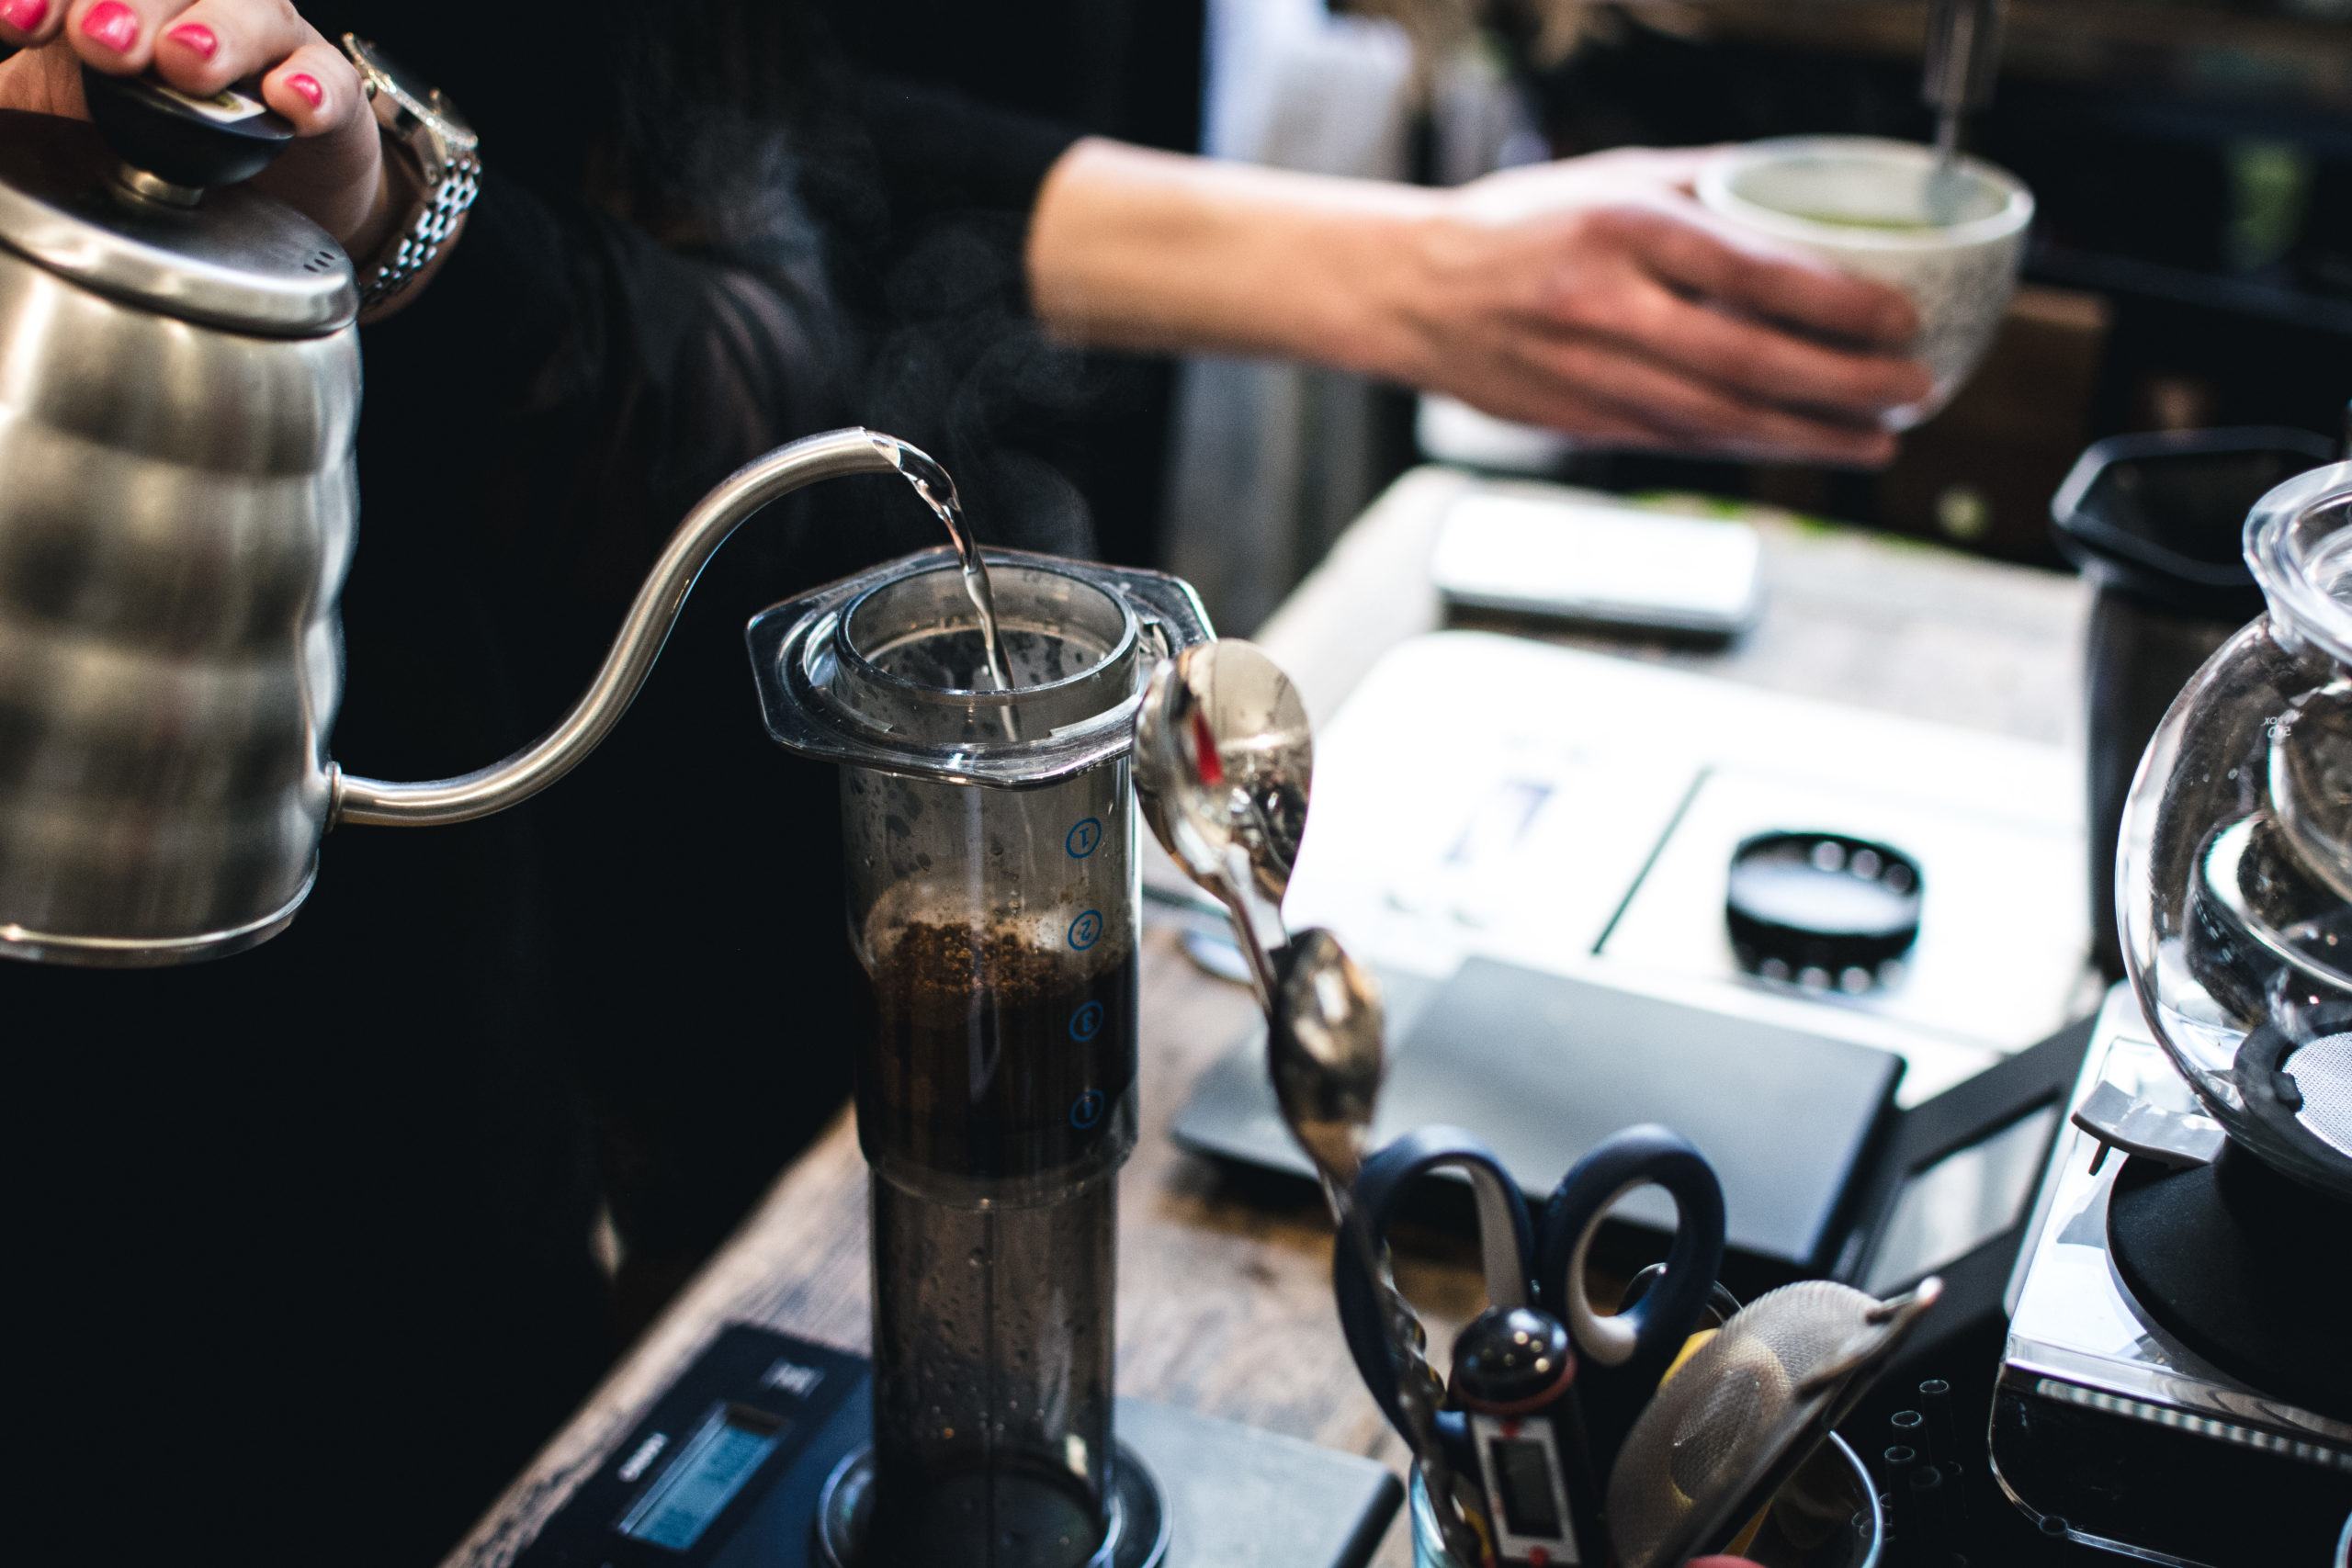 brewing-coffee-in-aeropress-CWGN92H-scaled